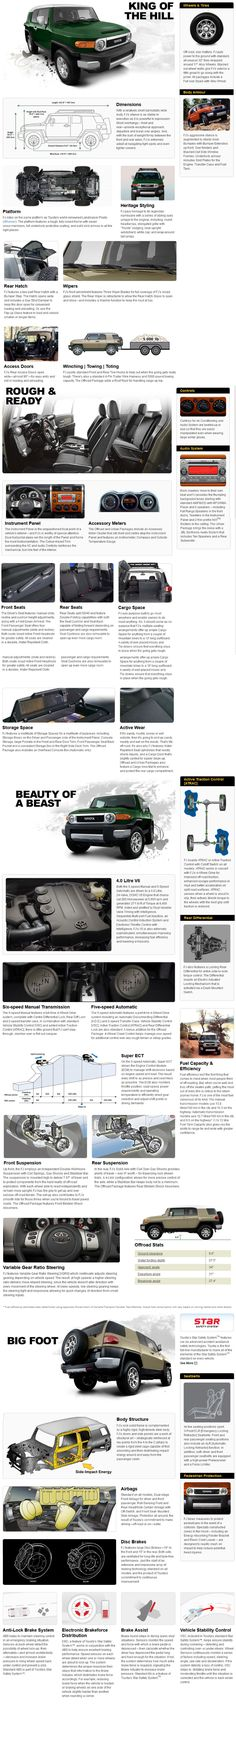 2014 Toyota FJ Cruiser Features                                                                                                                                                                                 More